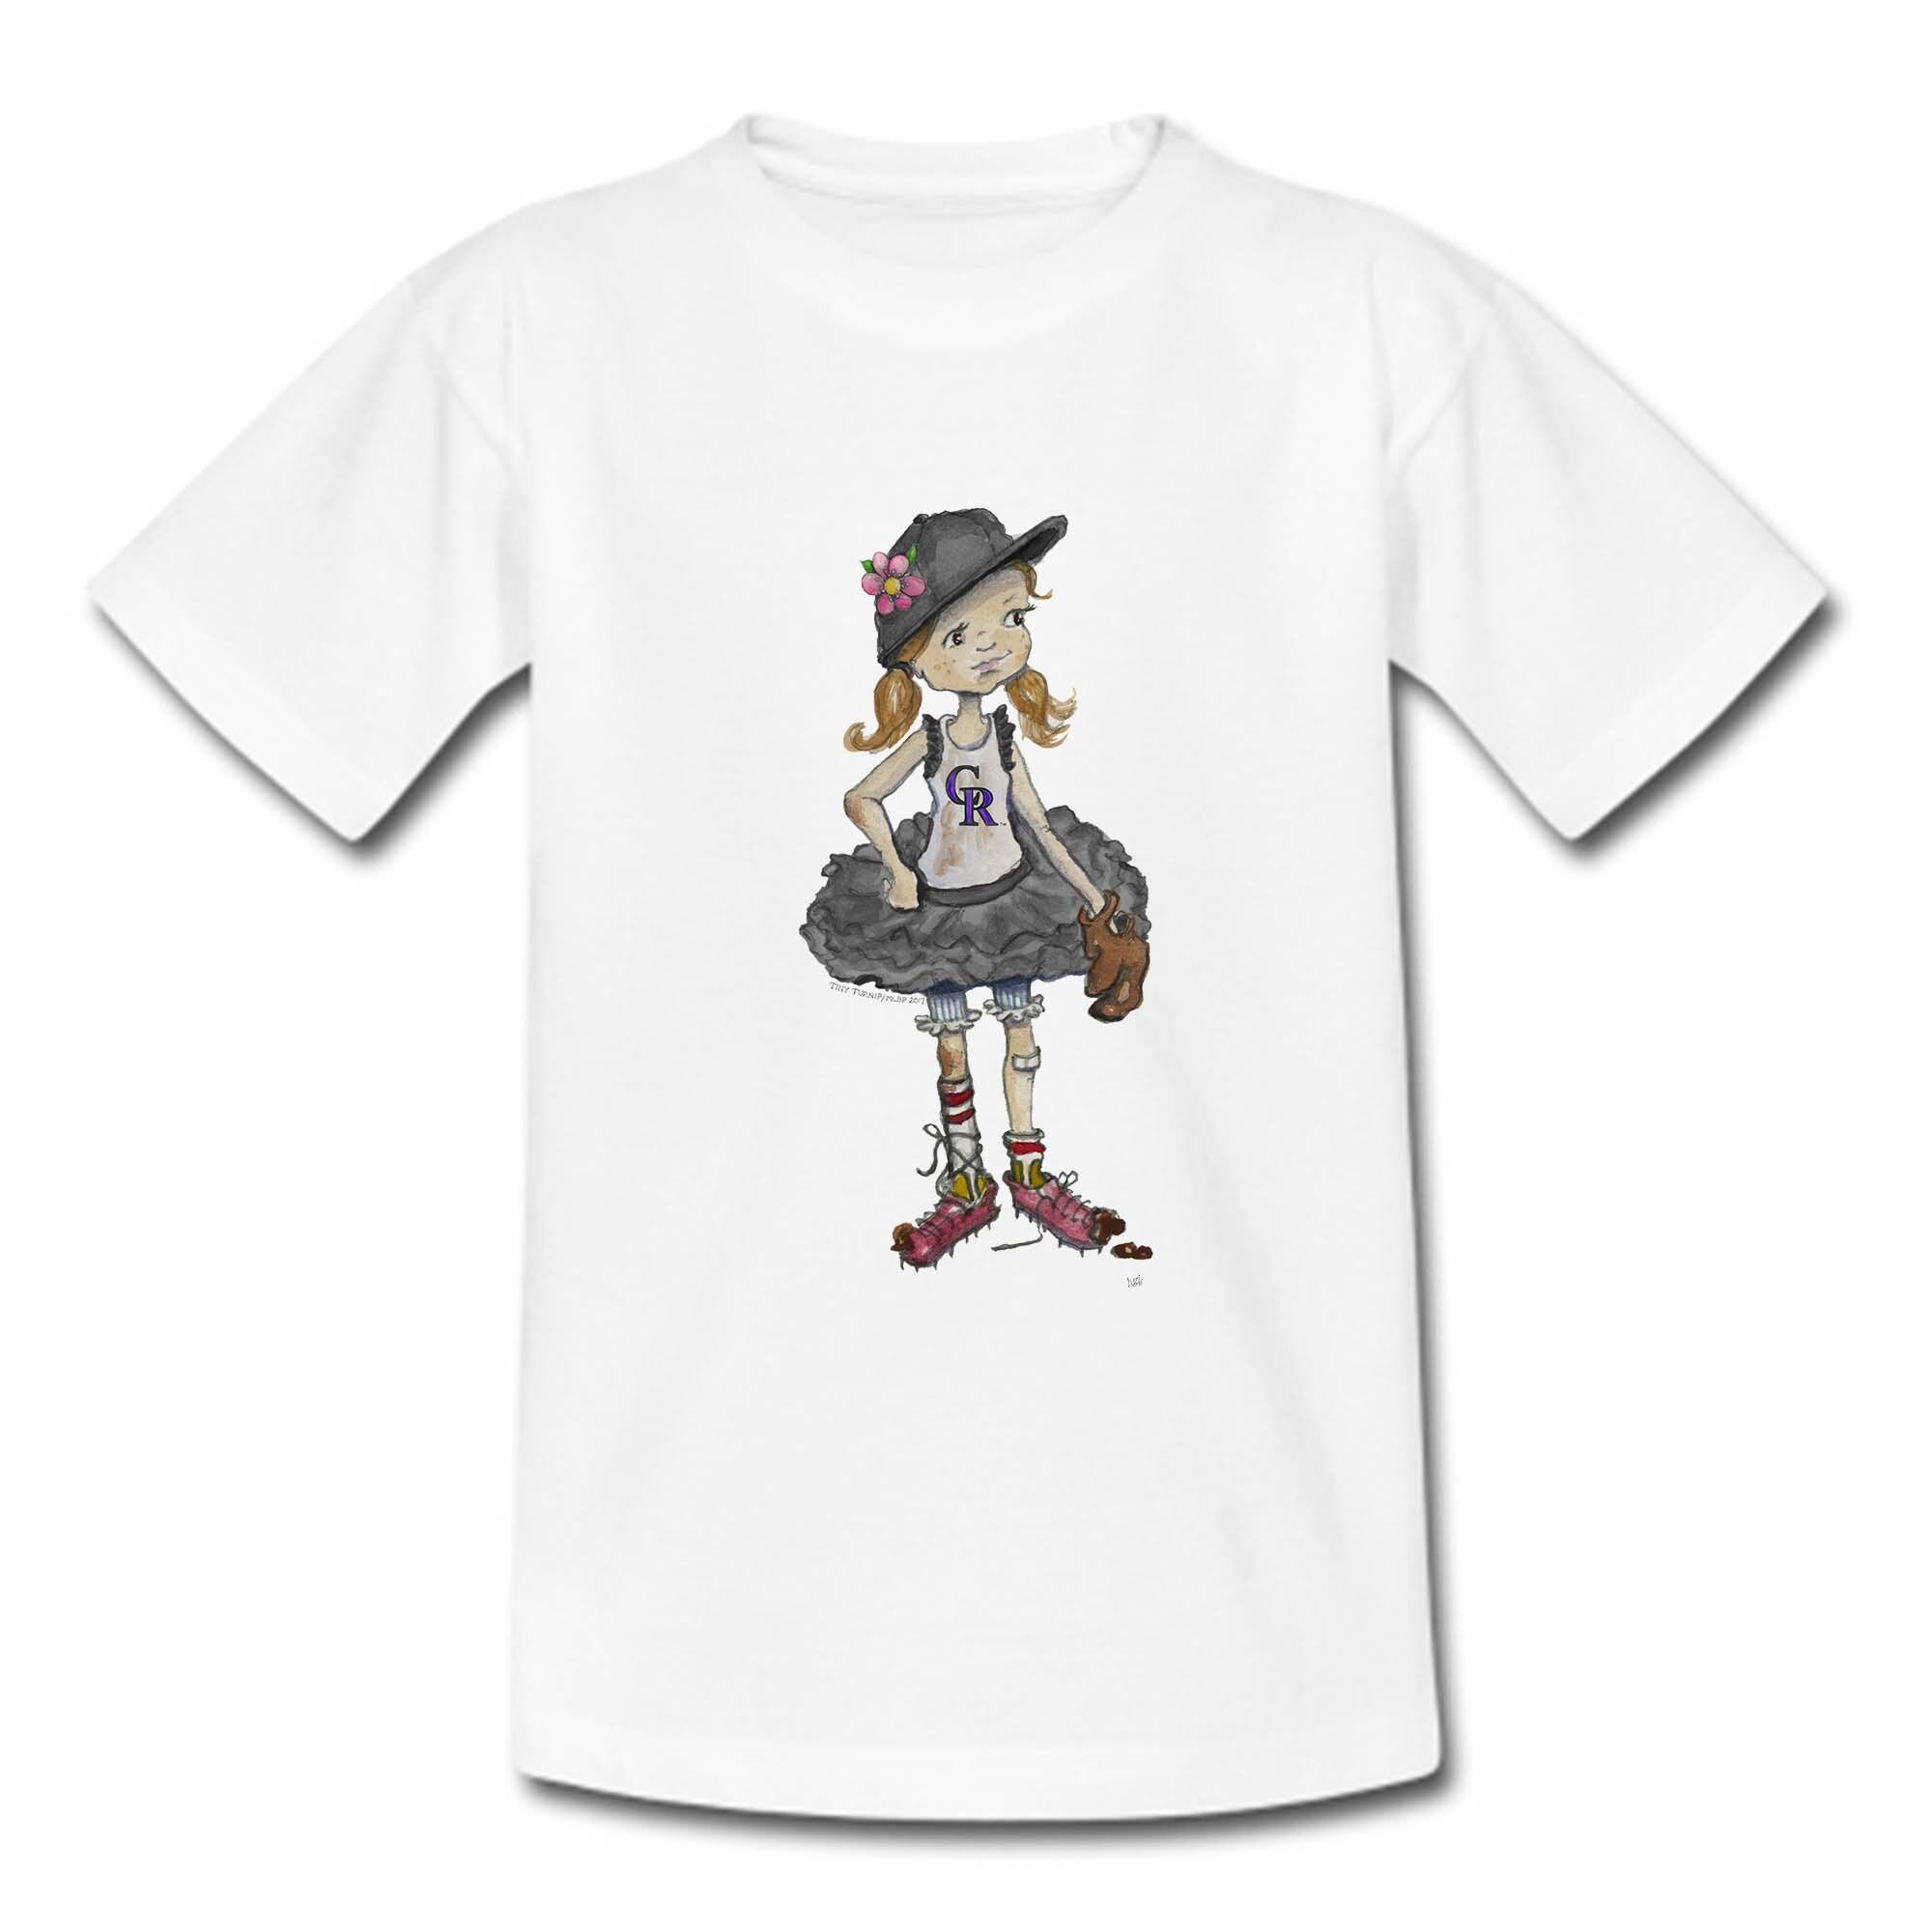 Colorado Rockies Tiny Turnip Girls Youth Babes T-Shirt - White